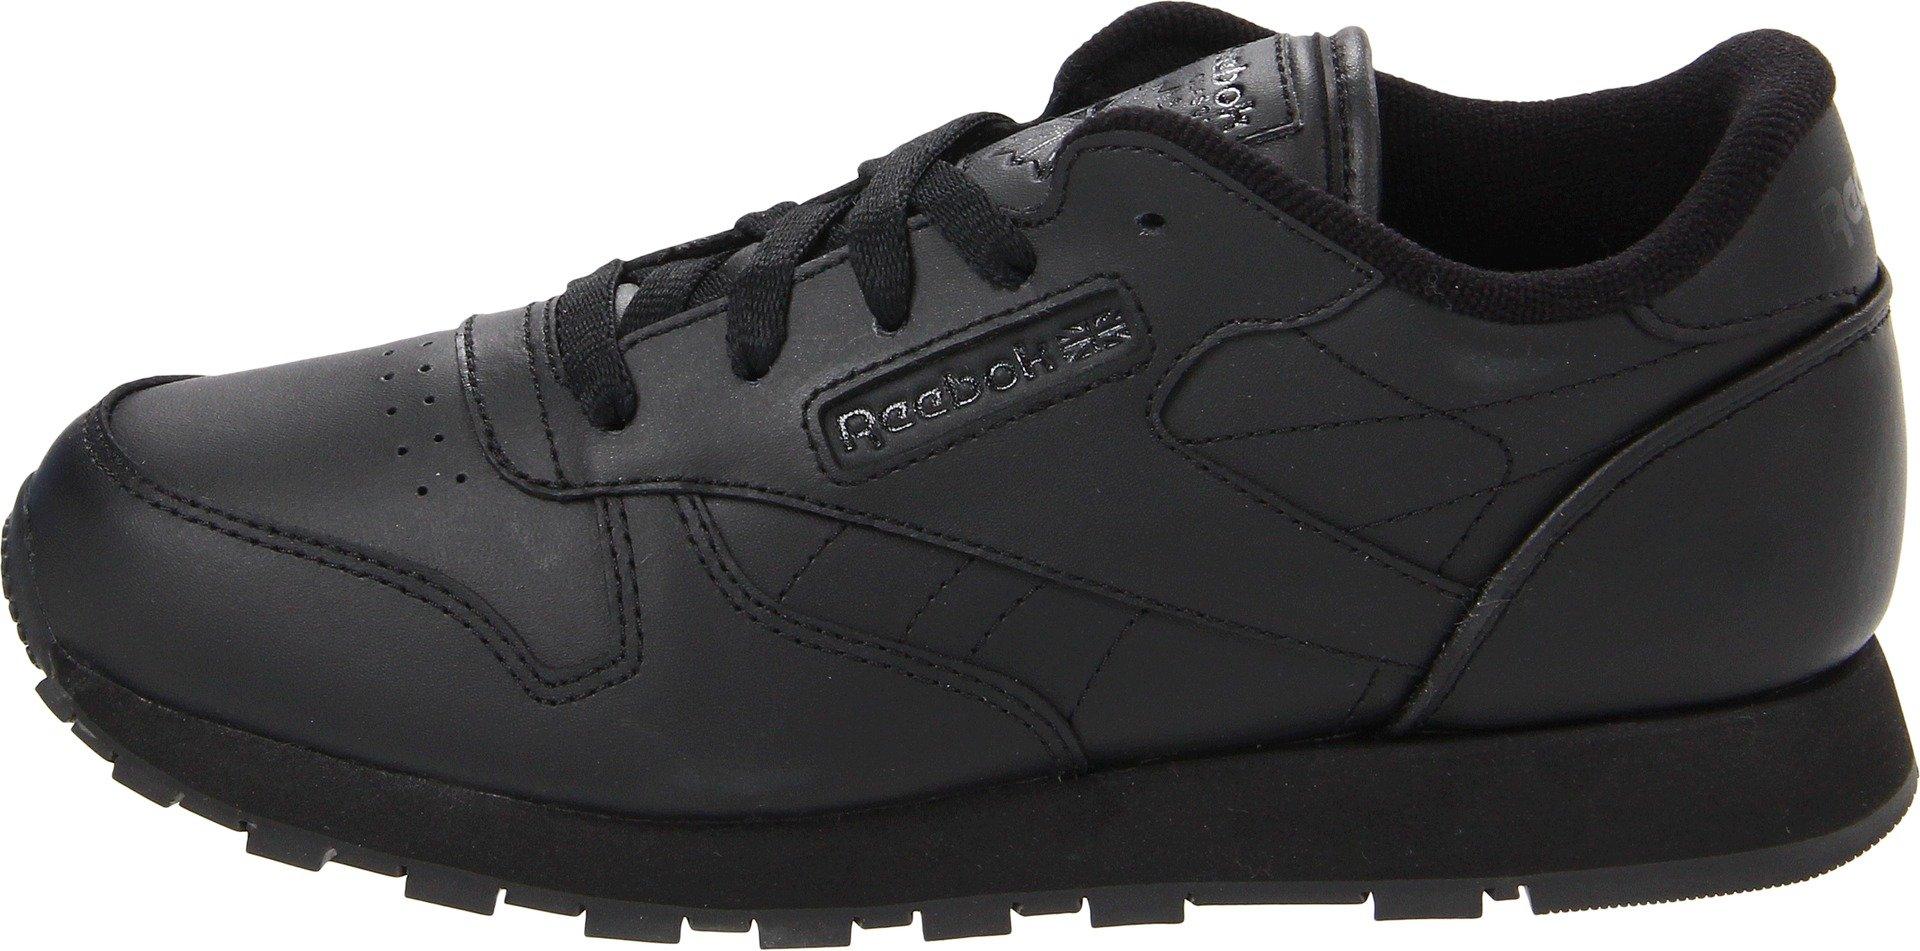 Reebok Classic Leather Shoe,Black/Black/Black,11.5 M US Little Kid by Reebok (Image #5)